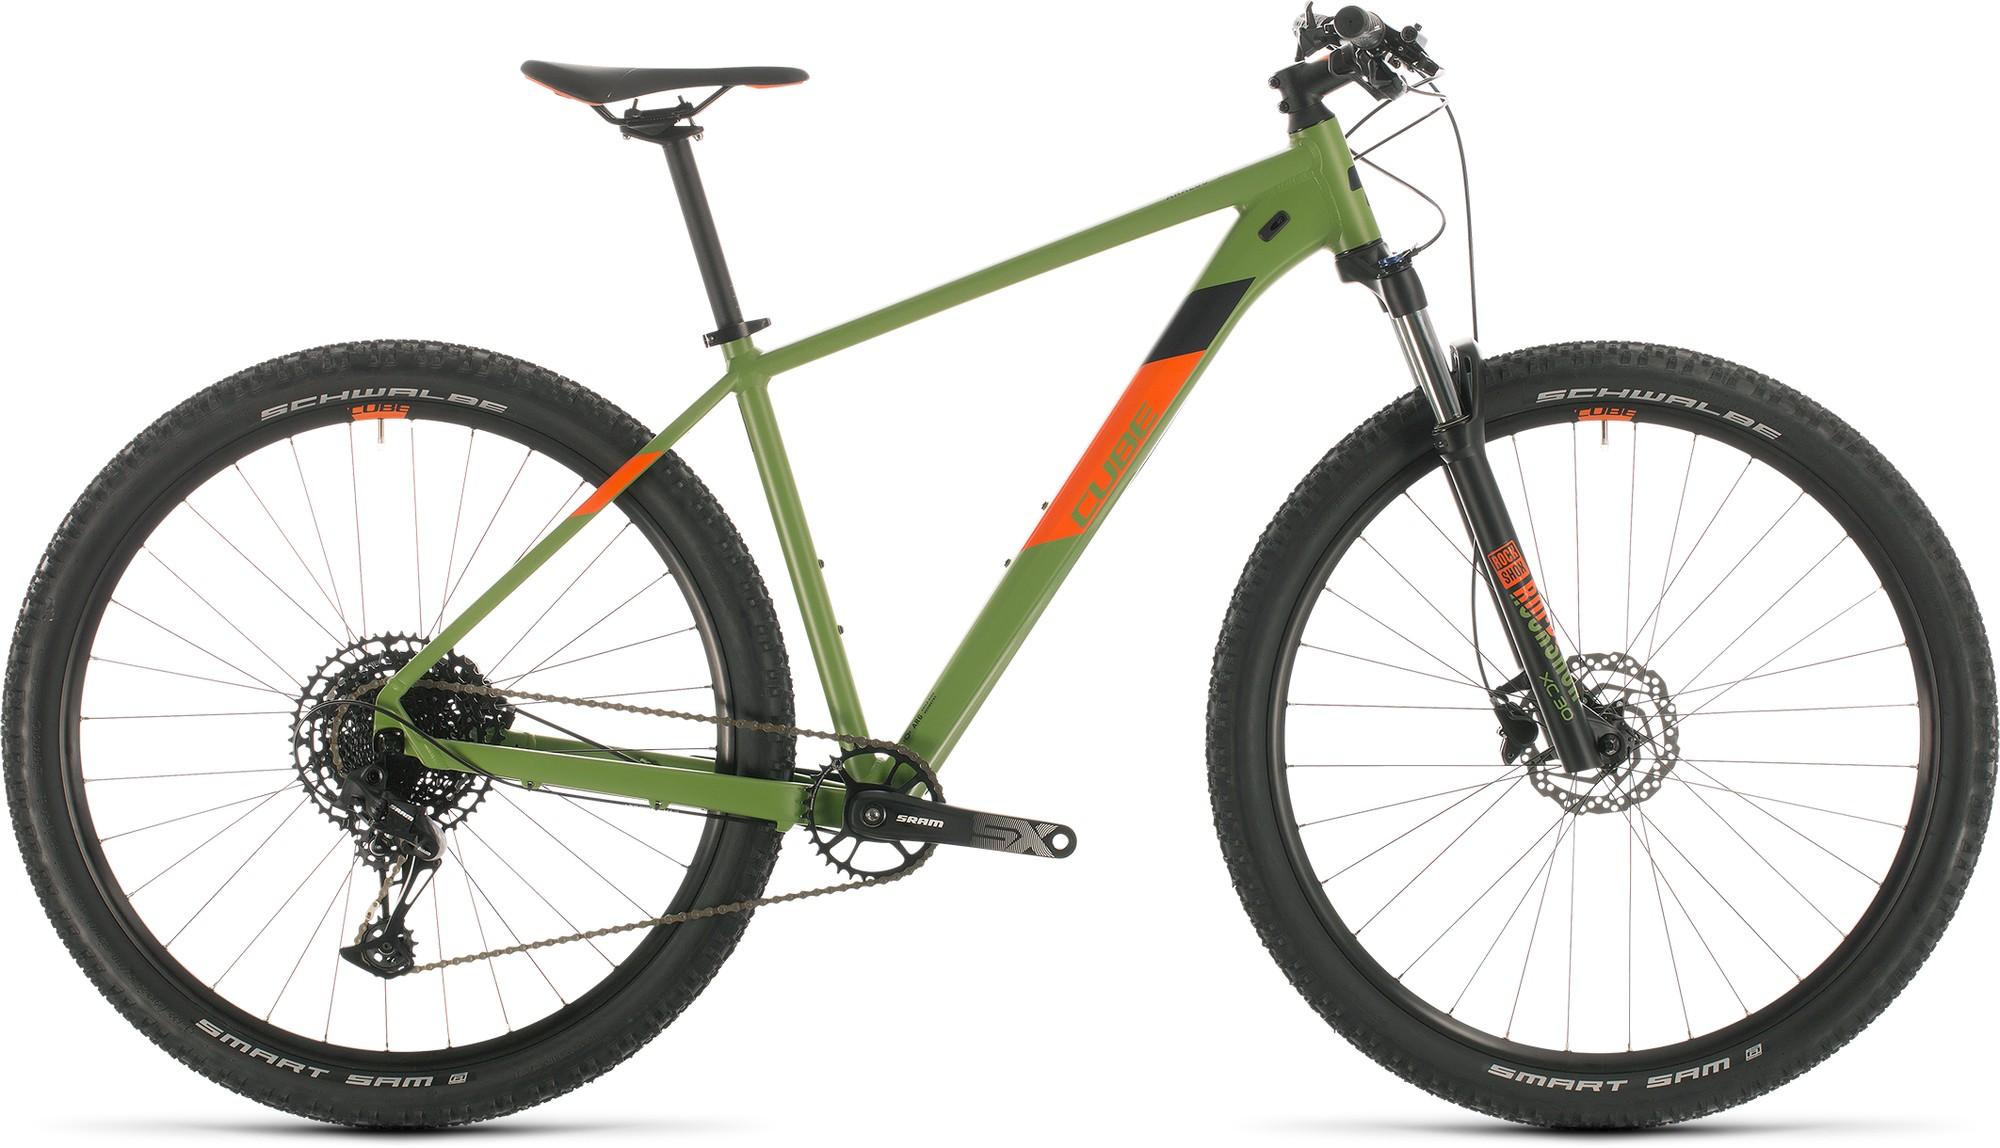 Cube Велосипед горный CUBE Analog велосипед cube hyde 2018